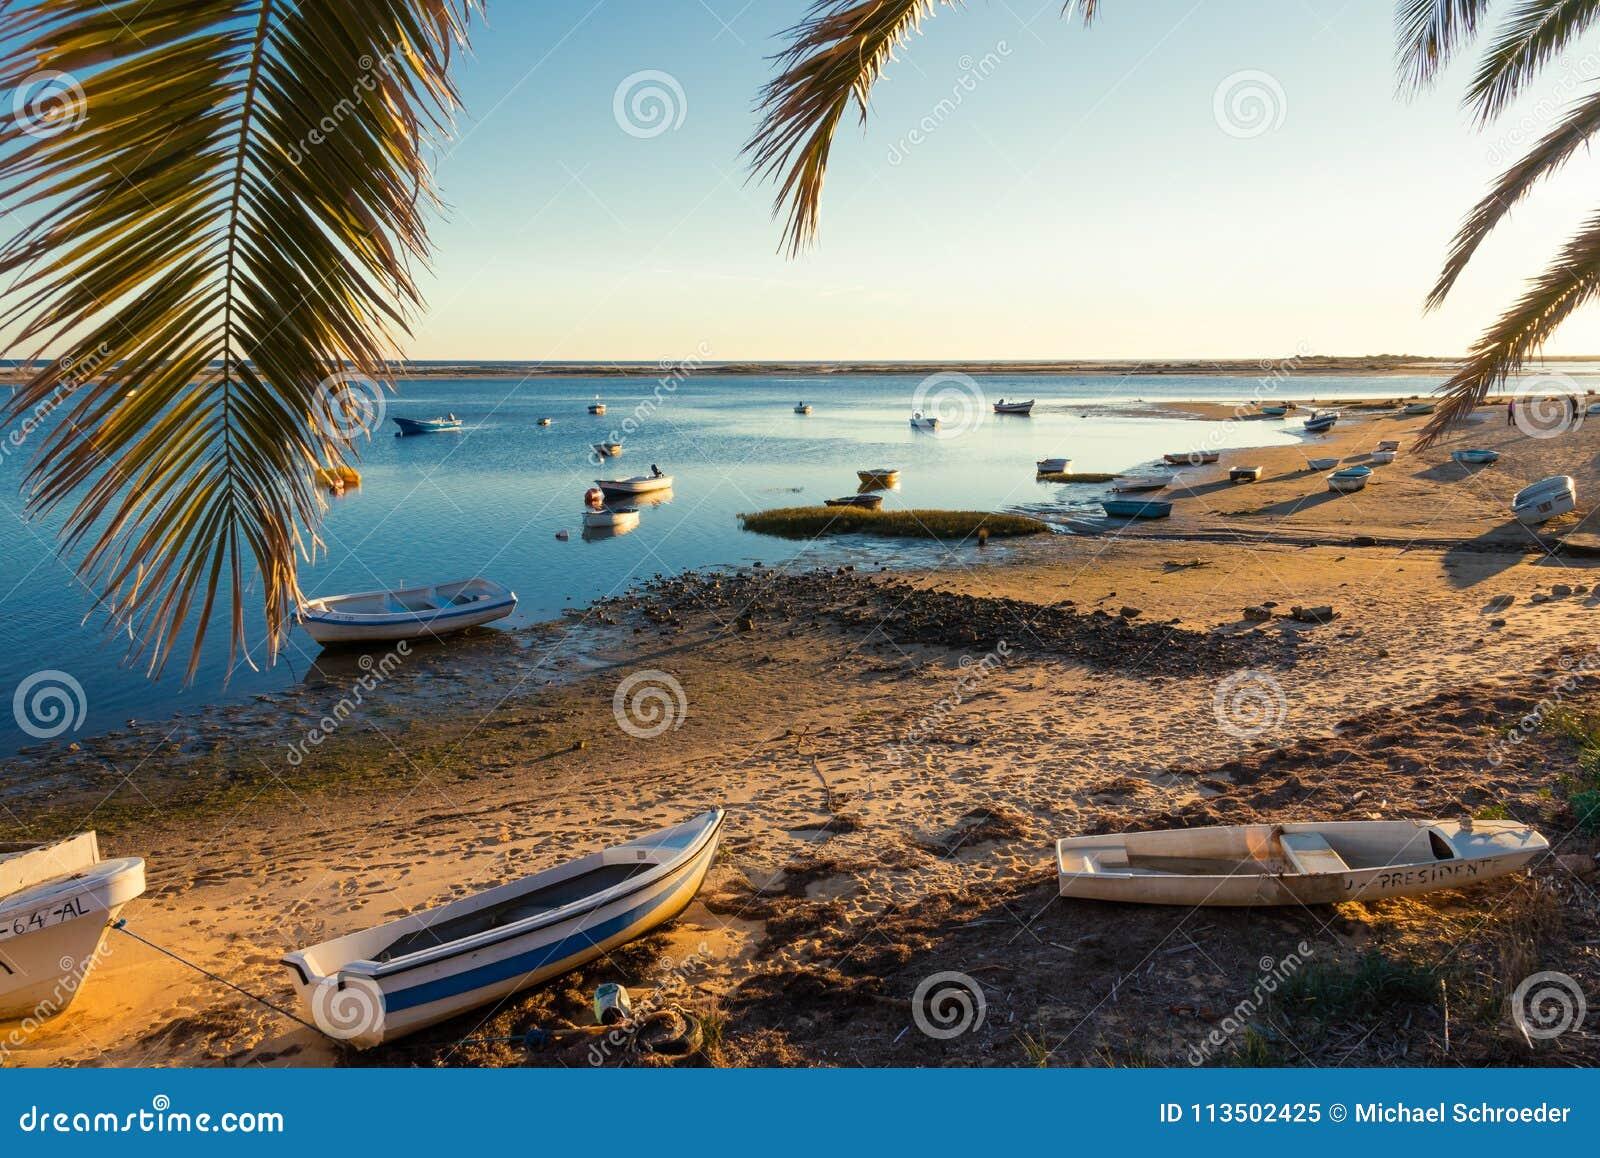 Natuurreservaat Ria Formosa - Algarve - Portugal